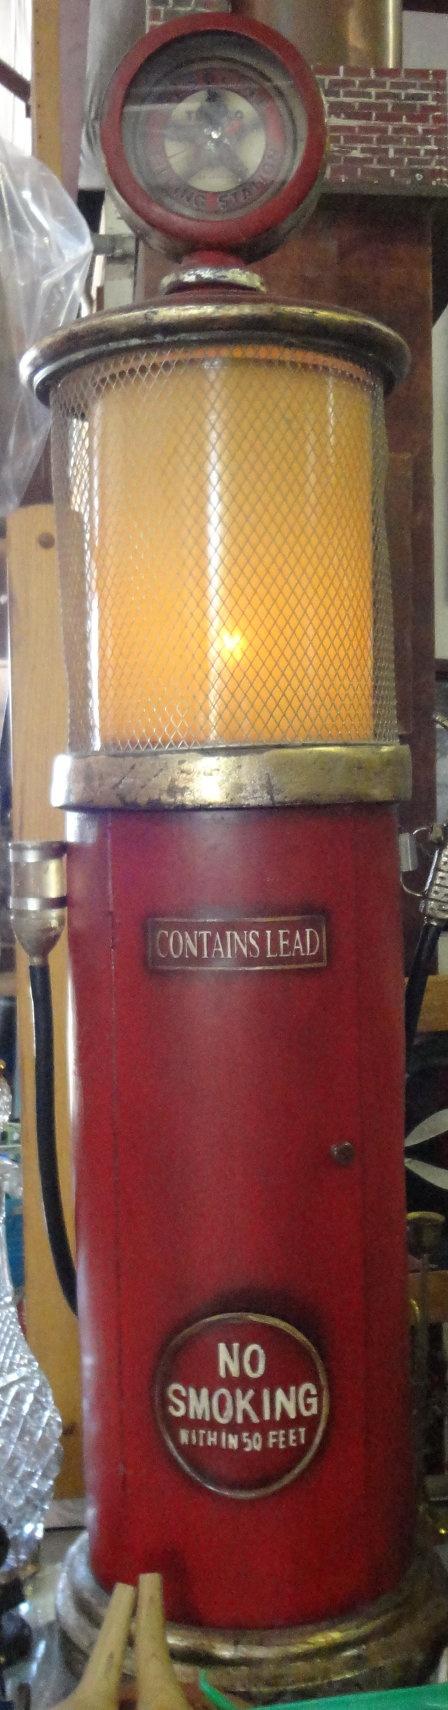 Vintage Wooden Texaco Gas Pump CD OR DVD Holder by tennesseehills, $70.00